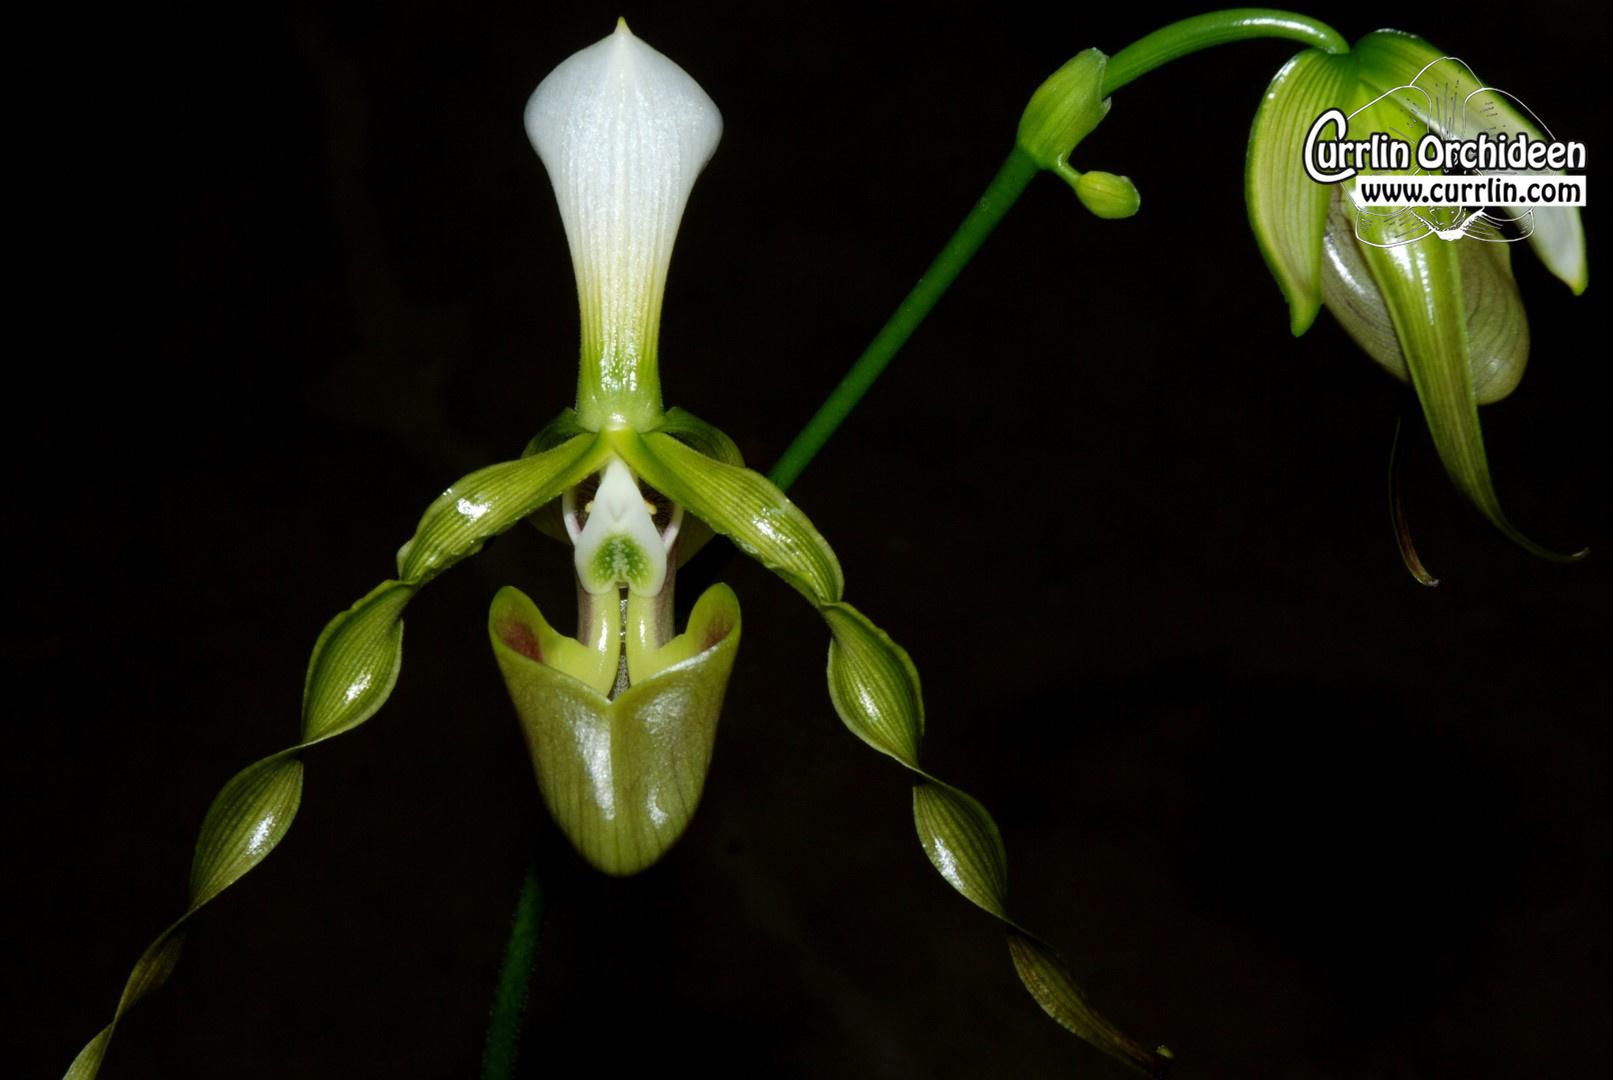 Paphiopedilum Dianthum Currlin Orchideen